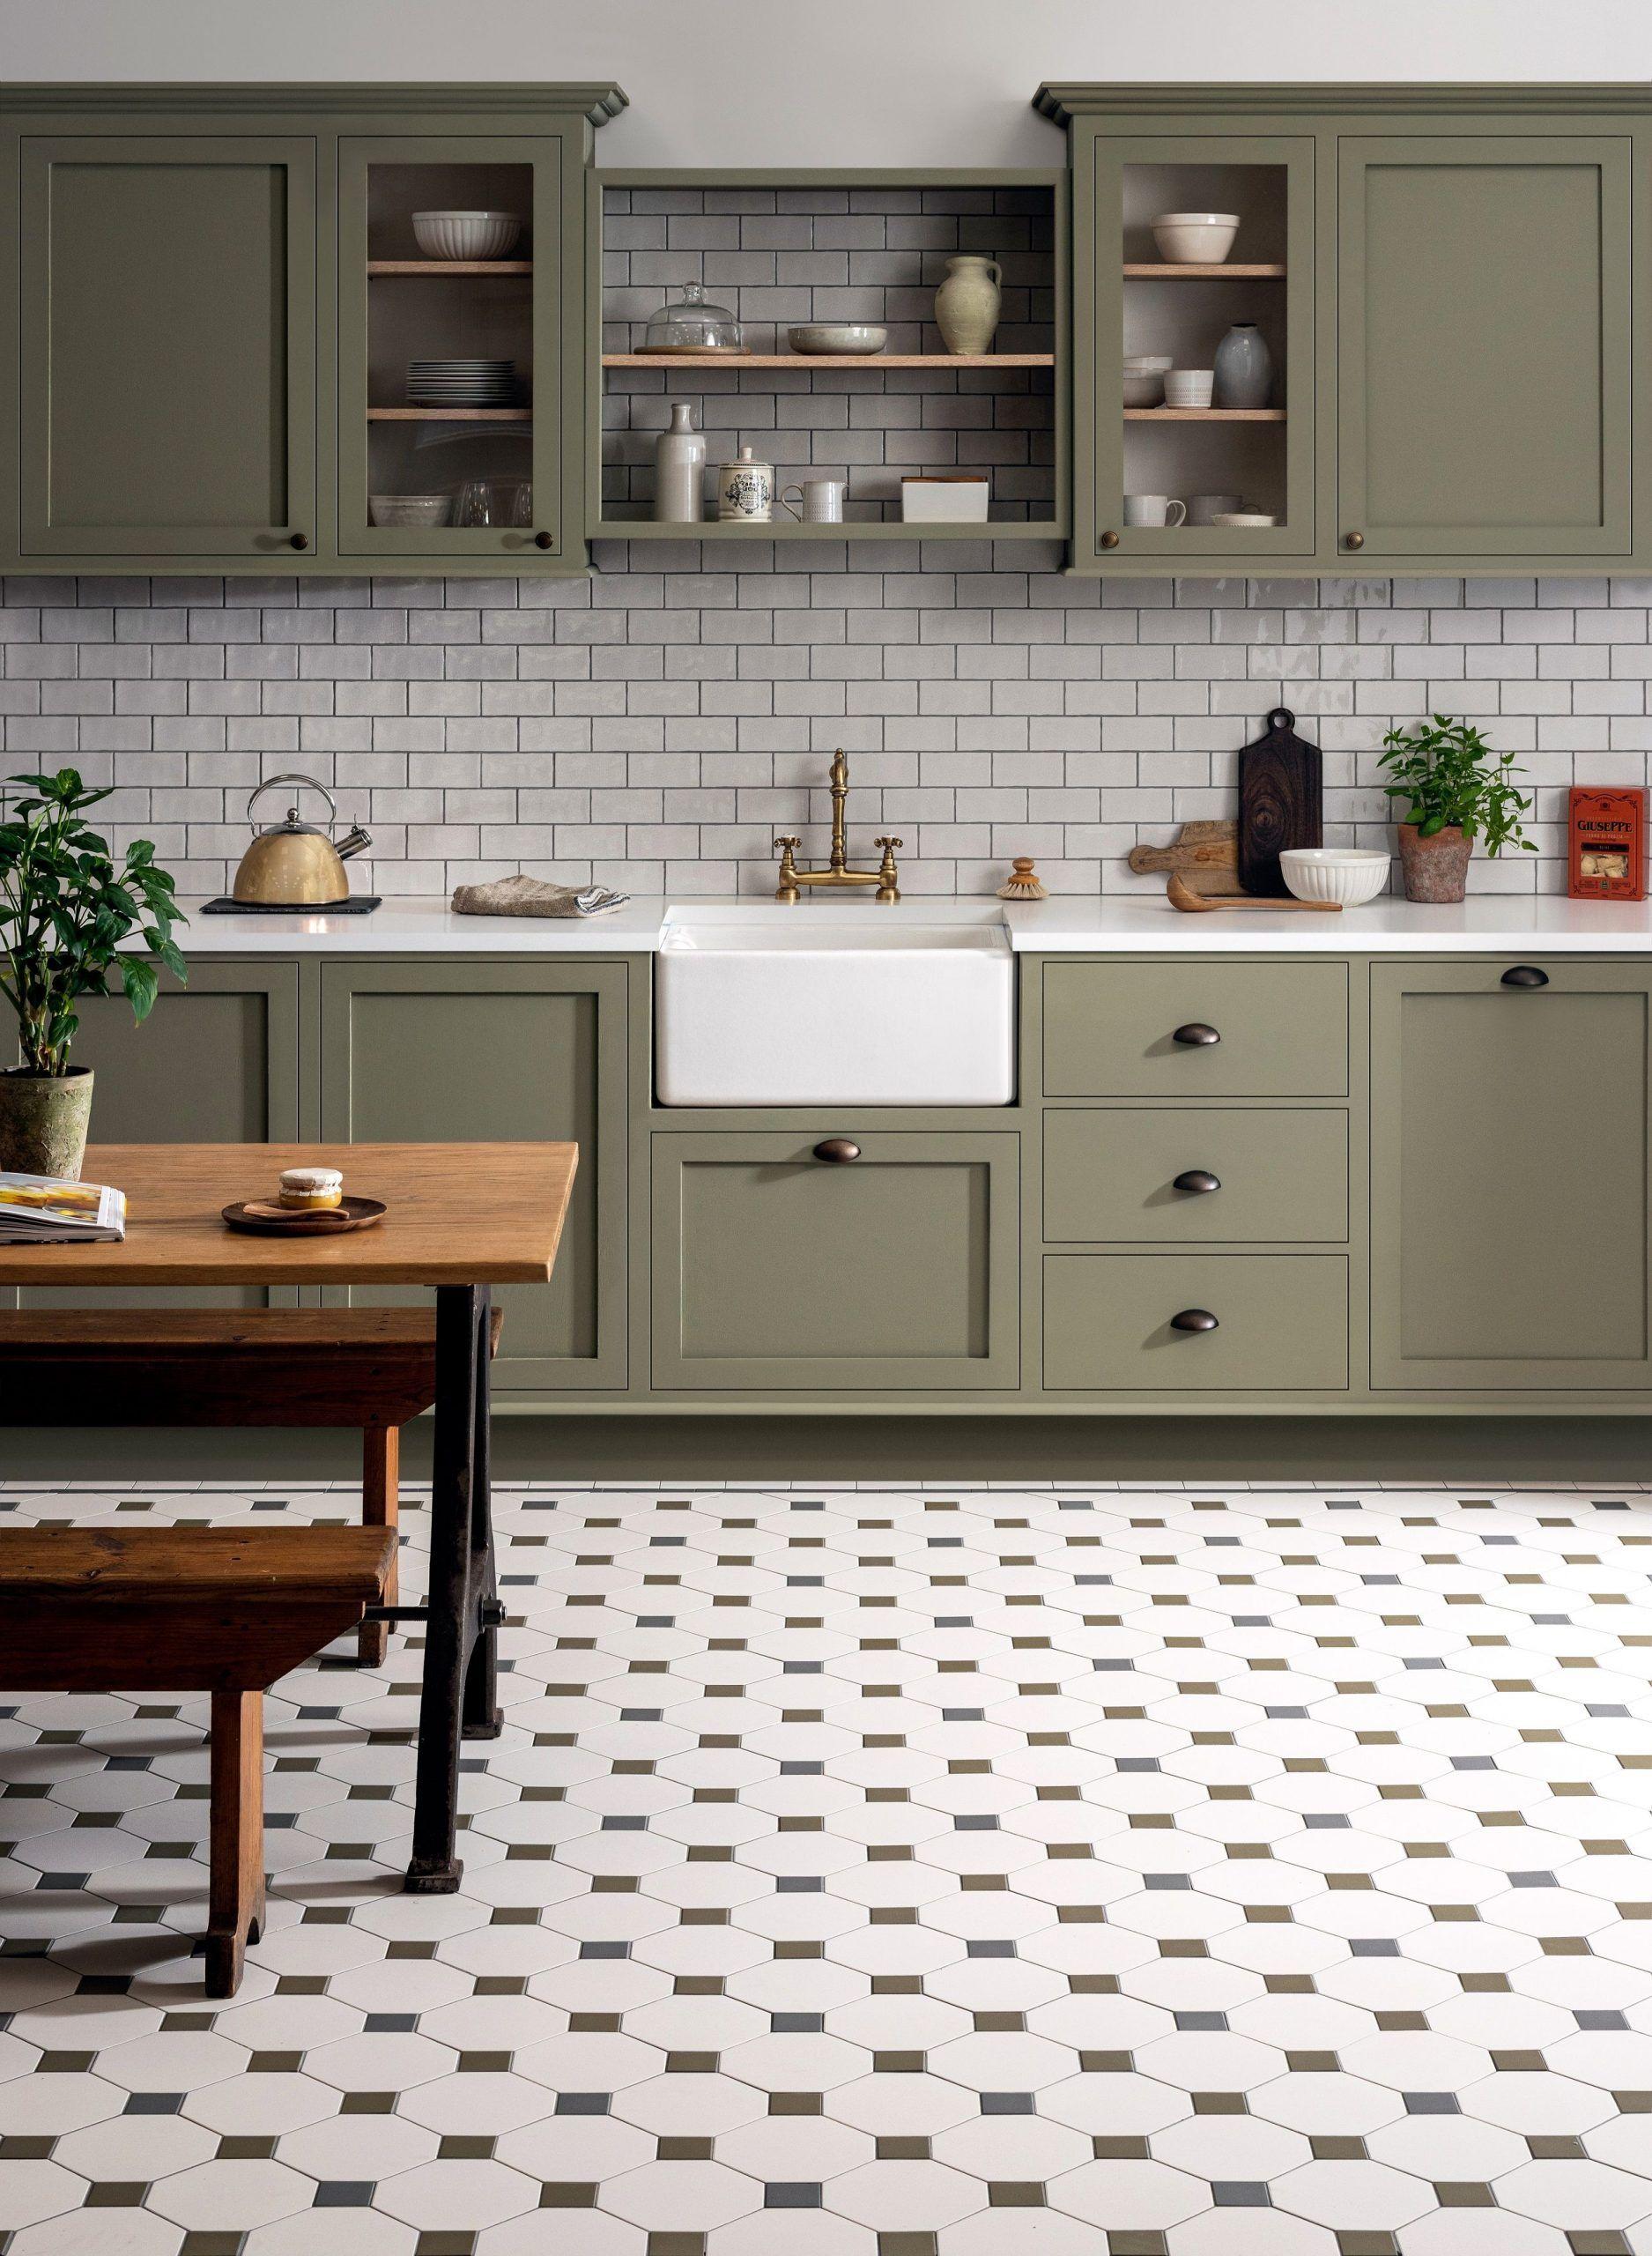 Popular Kitchen Floor Ideas For Your Home 21 Kitchen Style With Victorian Floor Tiles Kitchen Remodel Kitchen Flooring Kitchen Floor Tile Popular kitchen tile floors